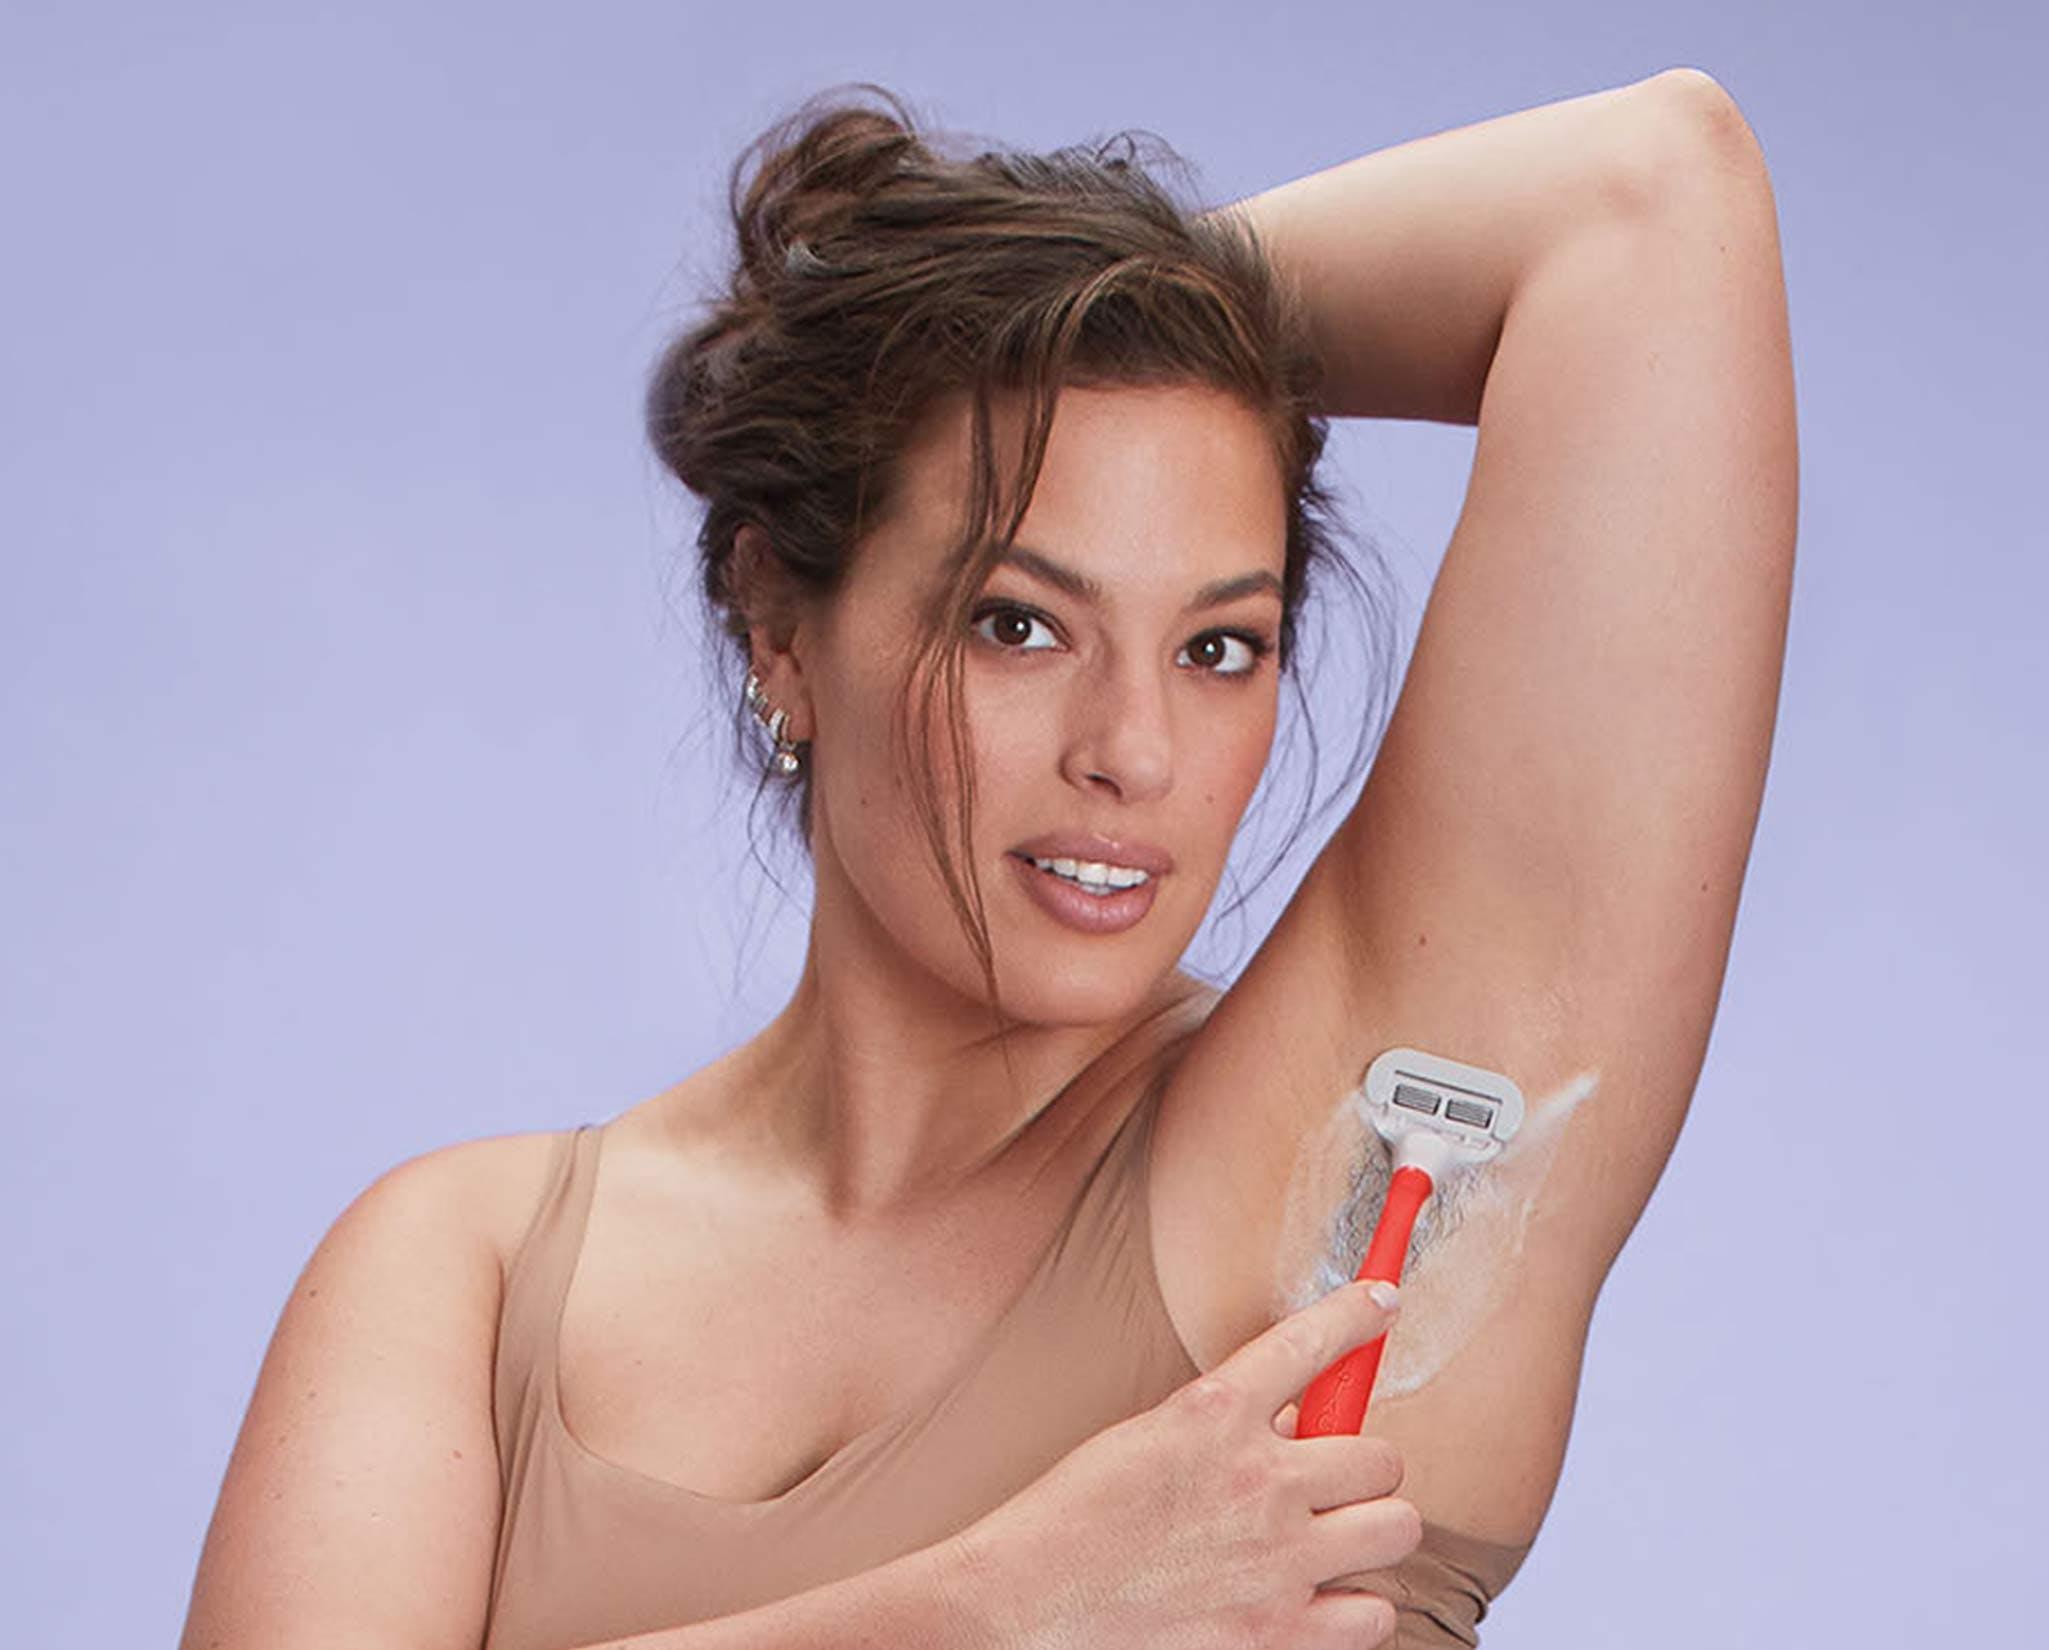 Ashley Graham shaving